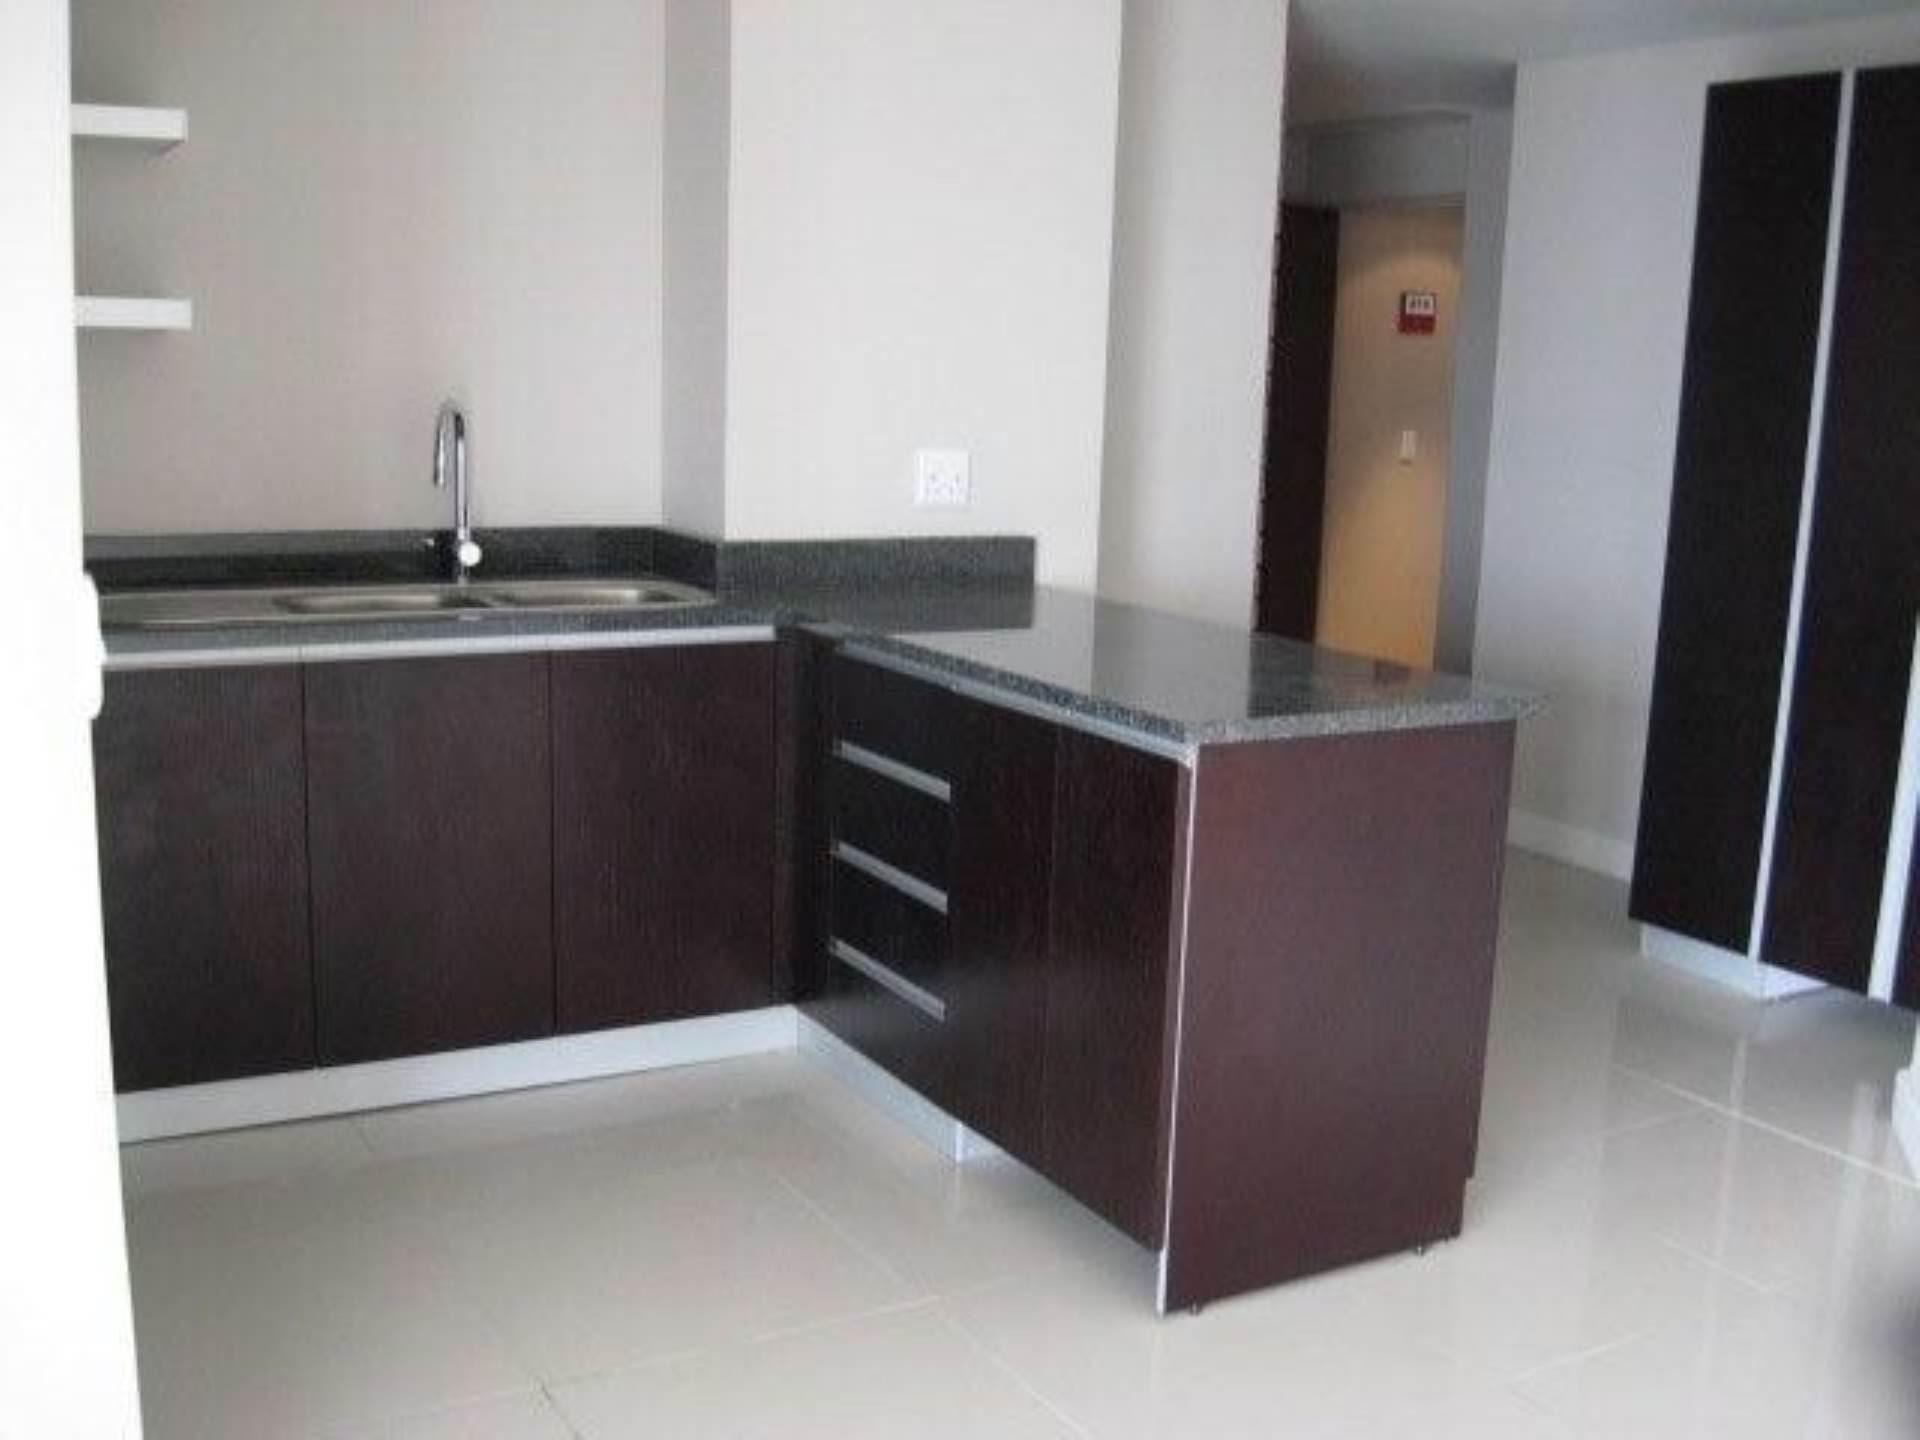 De Waterkant property for sale. Ref No: 13475436. Picture no 3